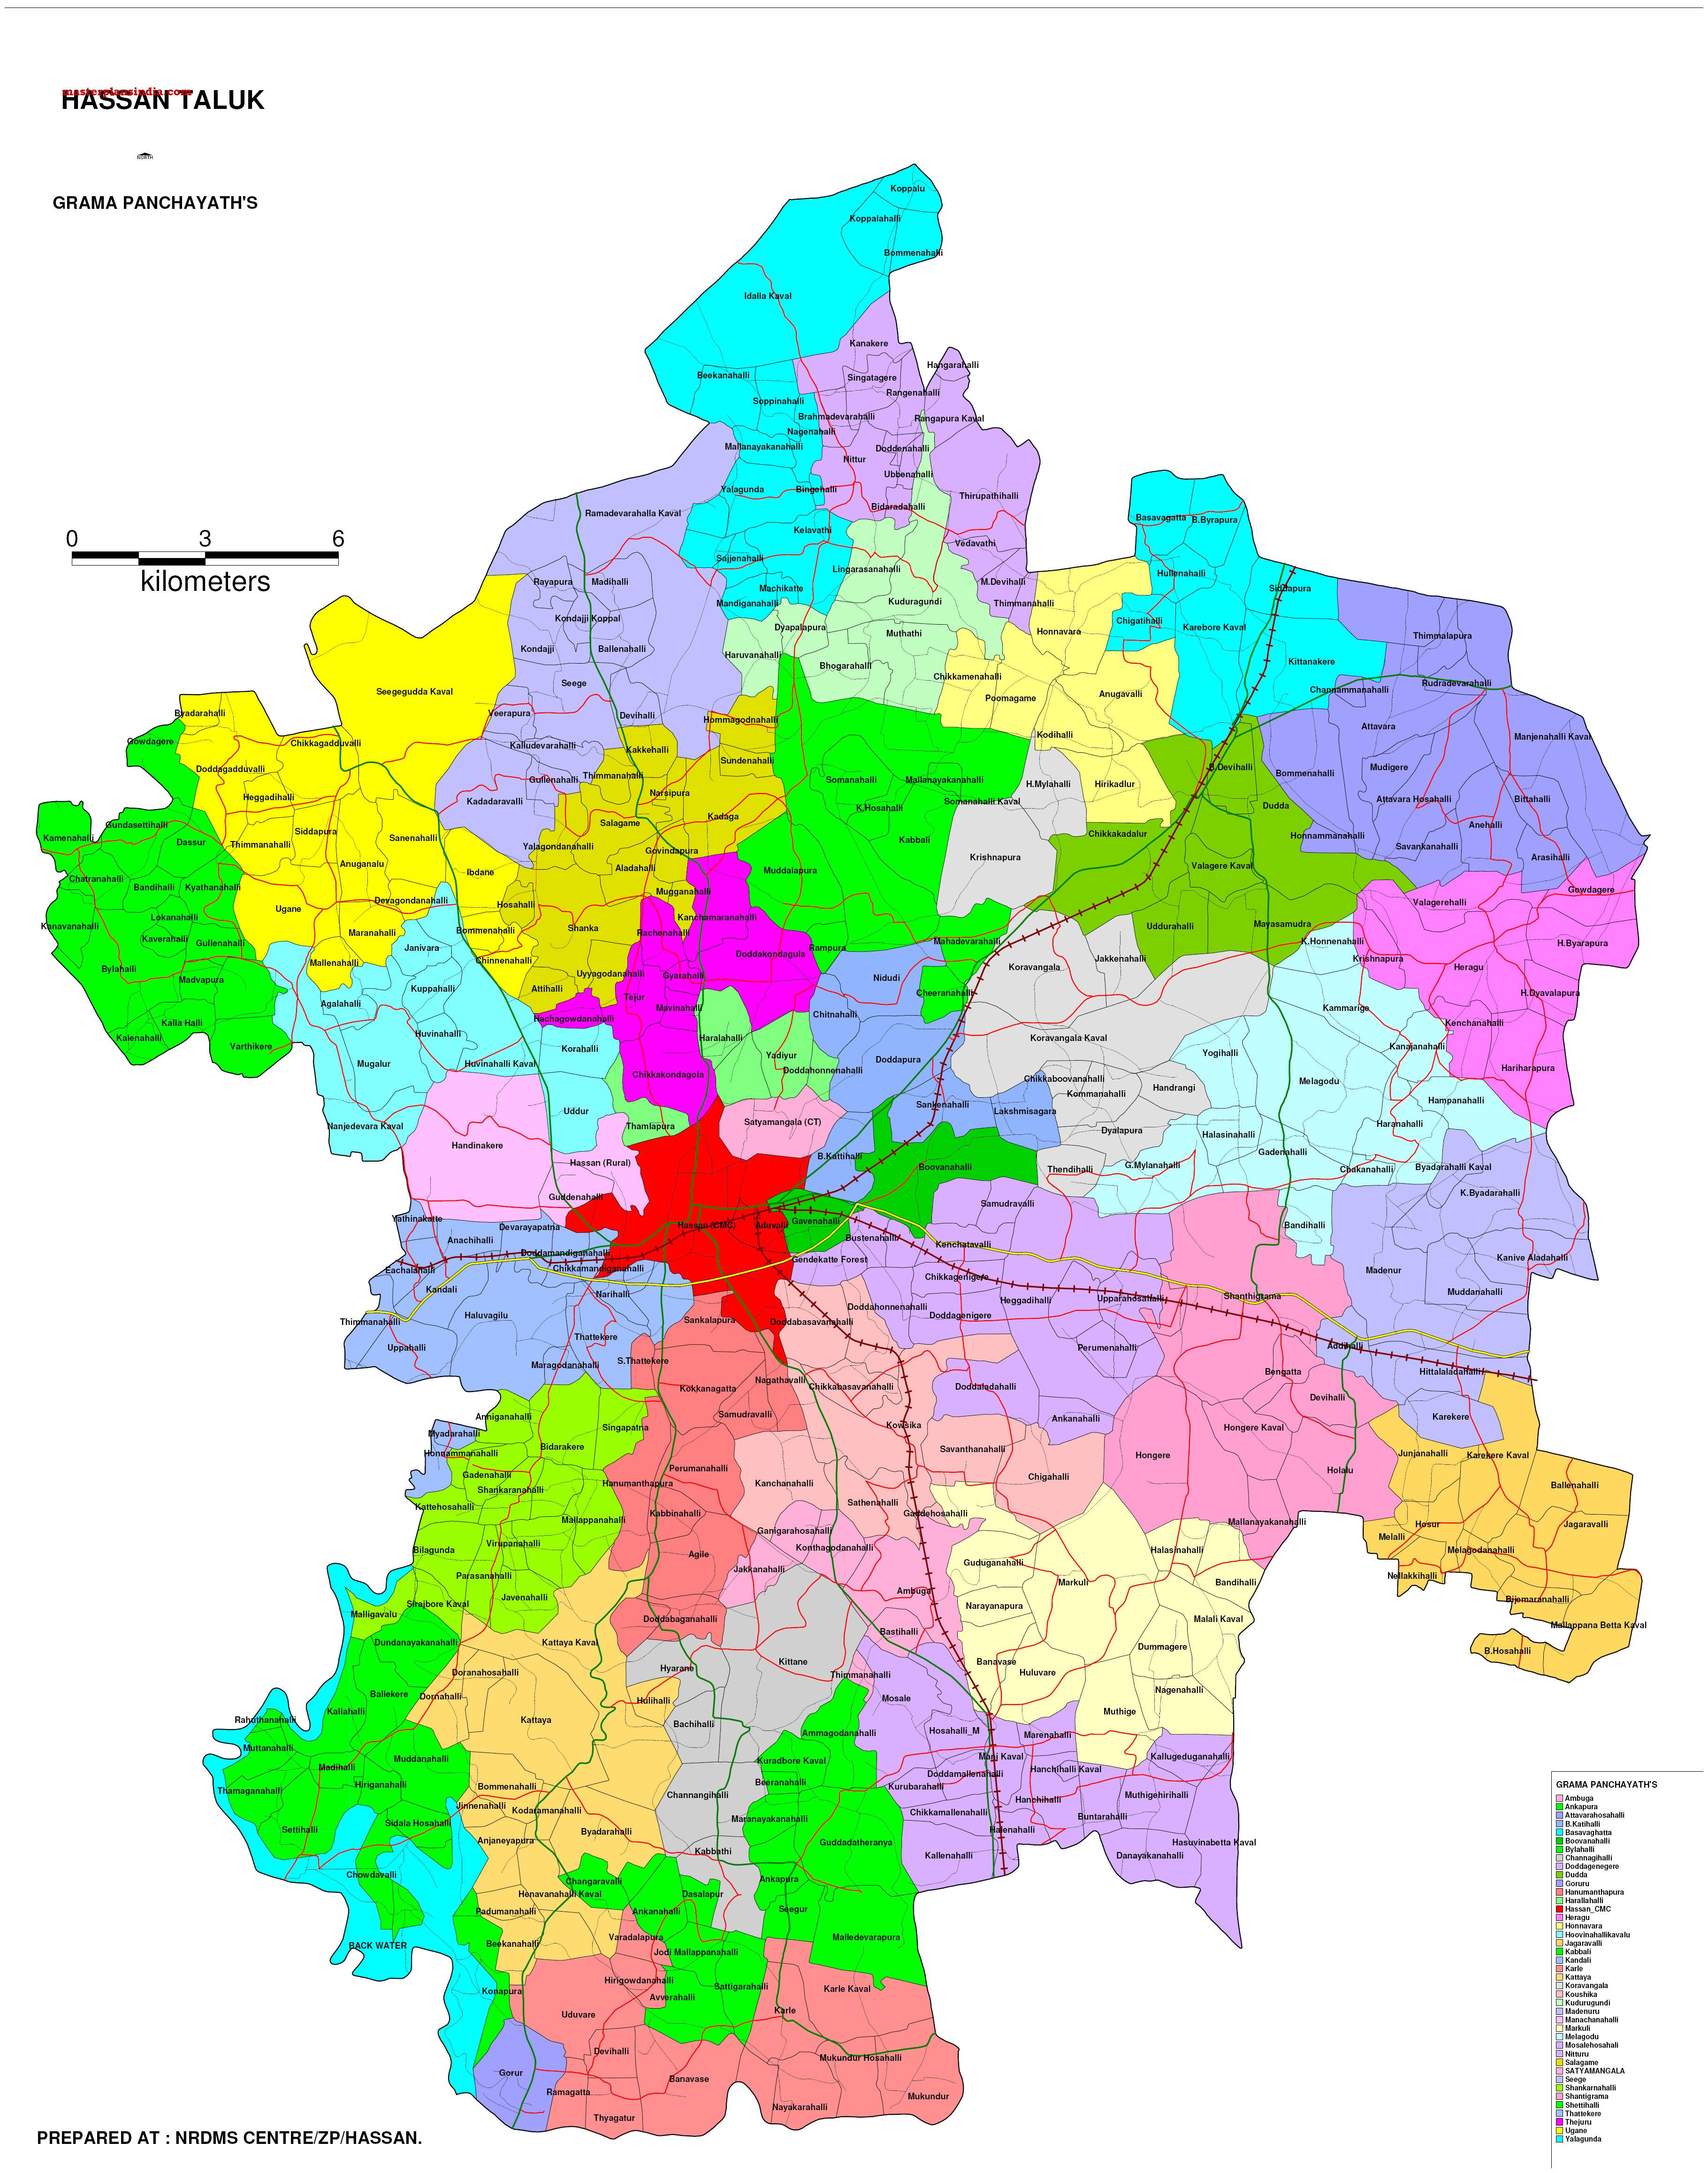 han-taluk-gramapanchayth-map Janani Suraksha Yojana Application Form Download on